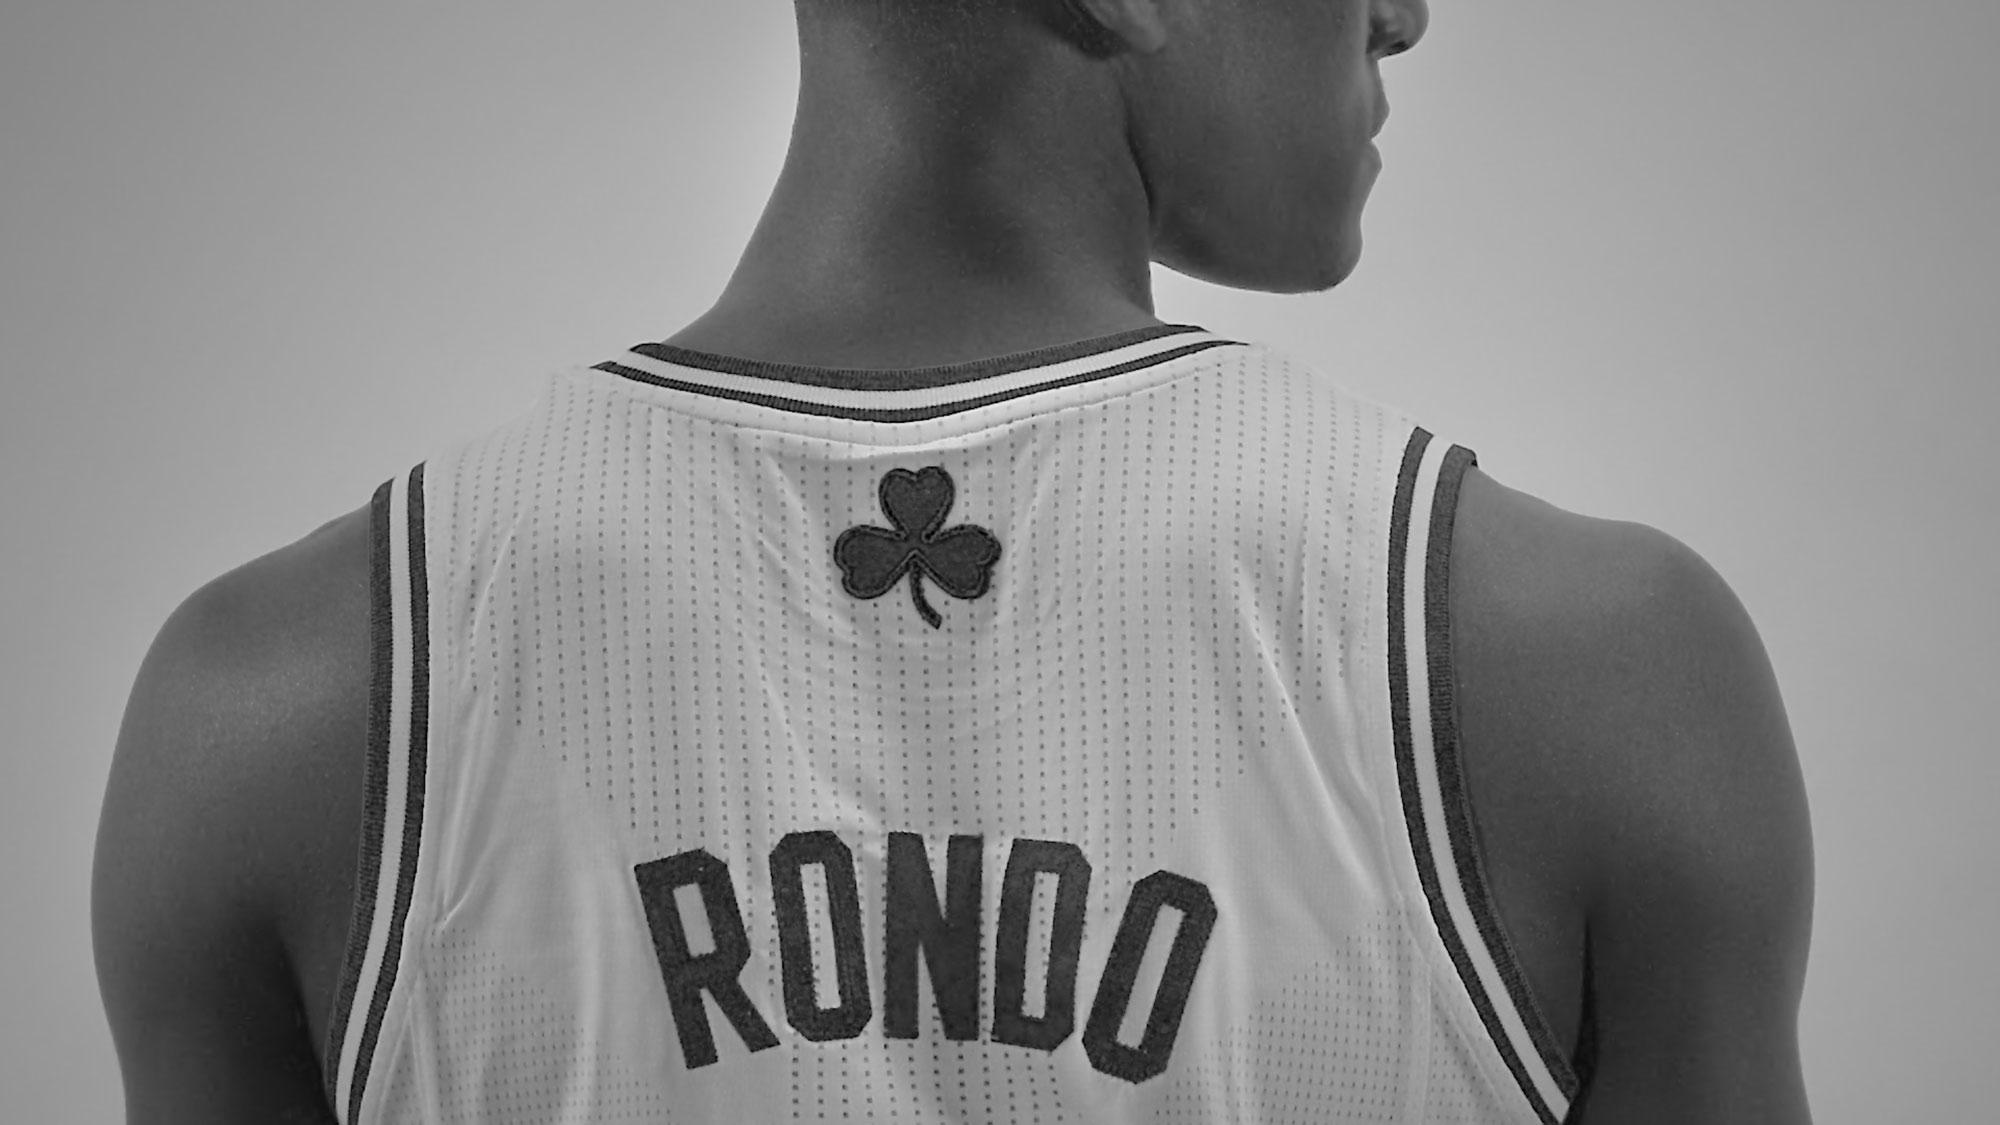 Mike's-Rondo.jpg